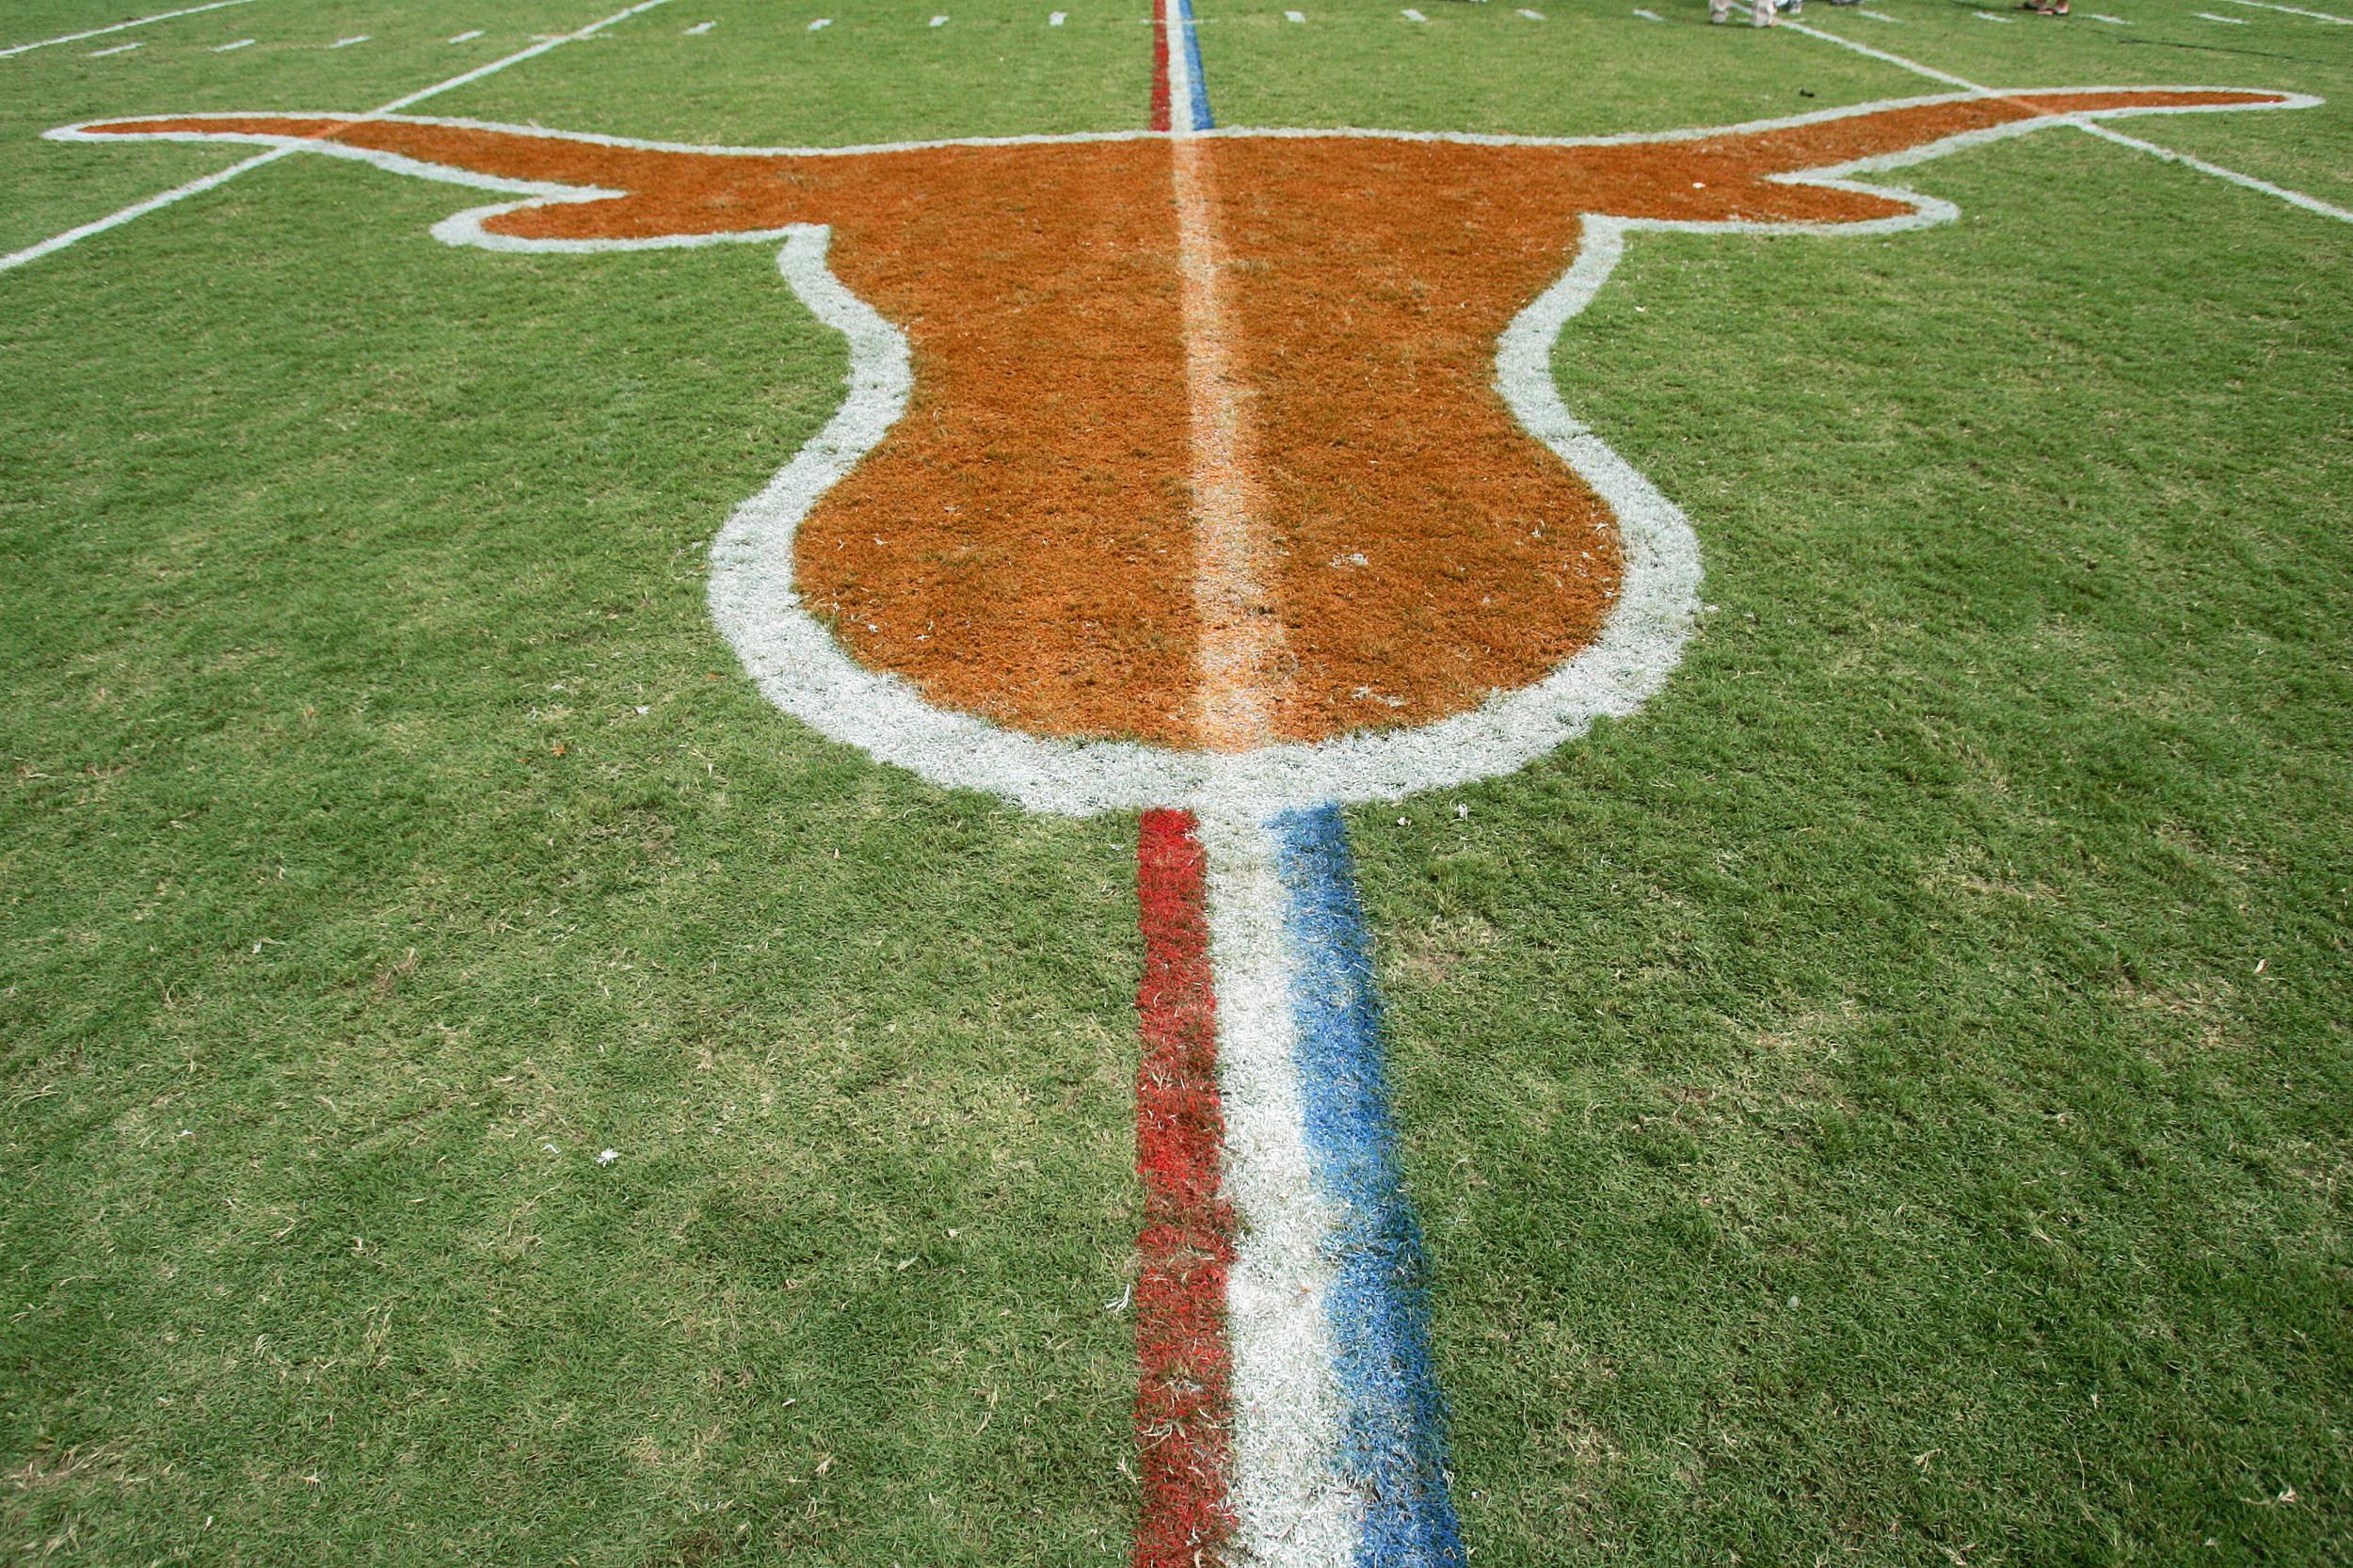 North Texas Eagles v Texas Longhorns